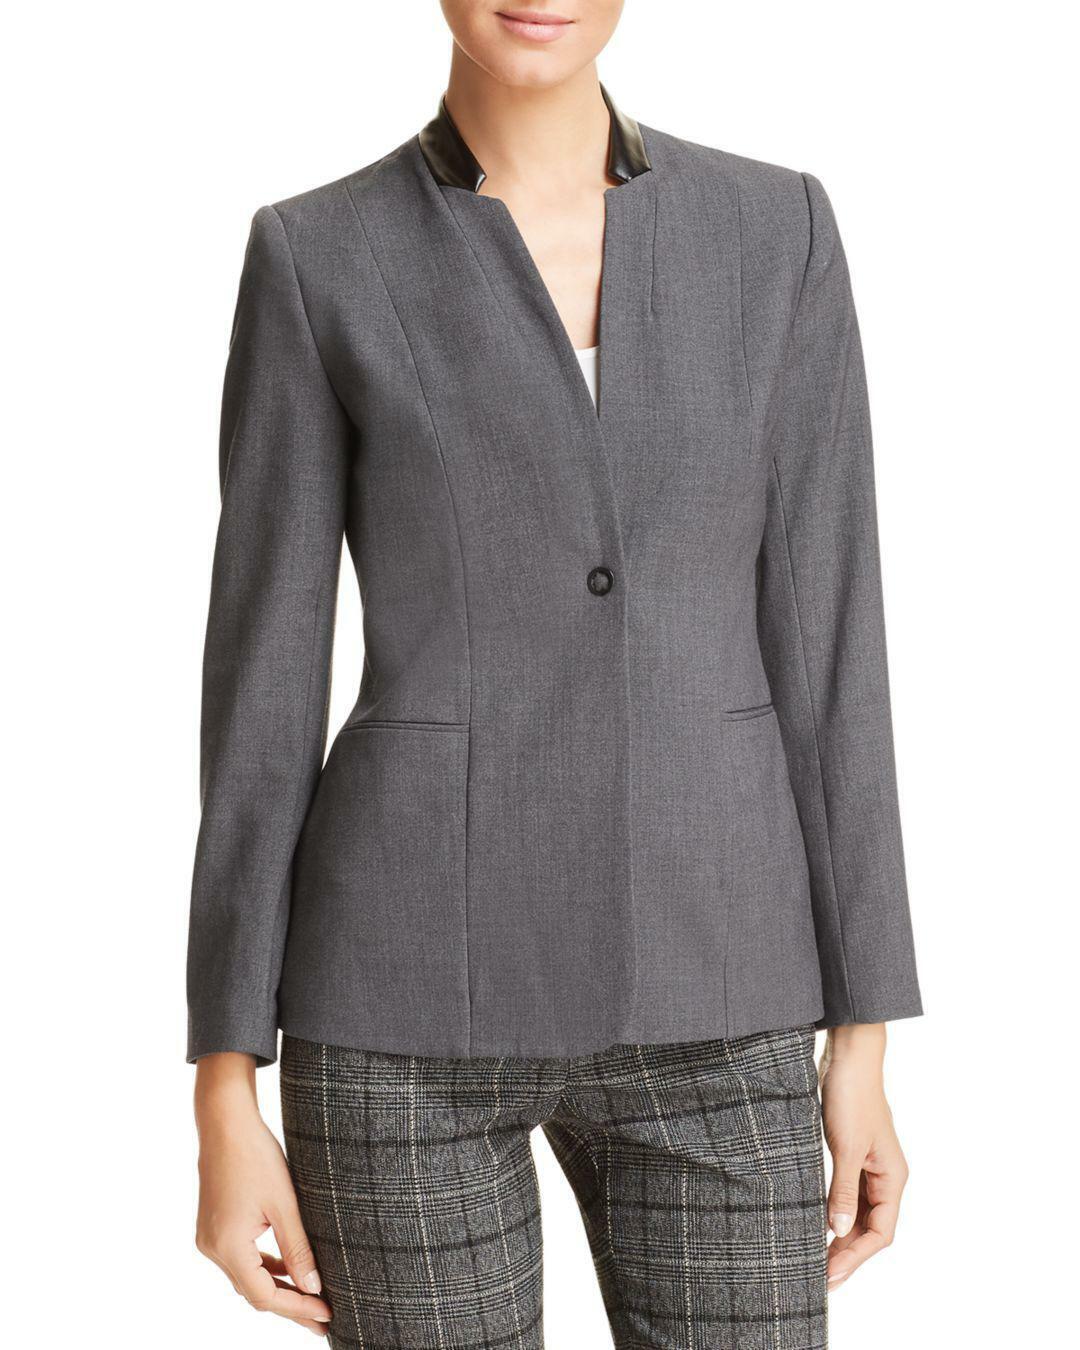 NWT T Tahari Womens Charcoal Faux Leather Trim Blazer size 8